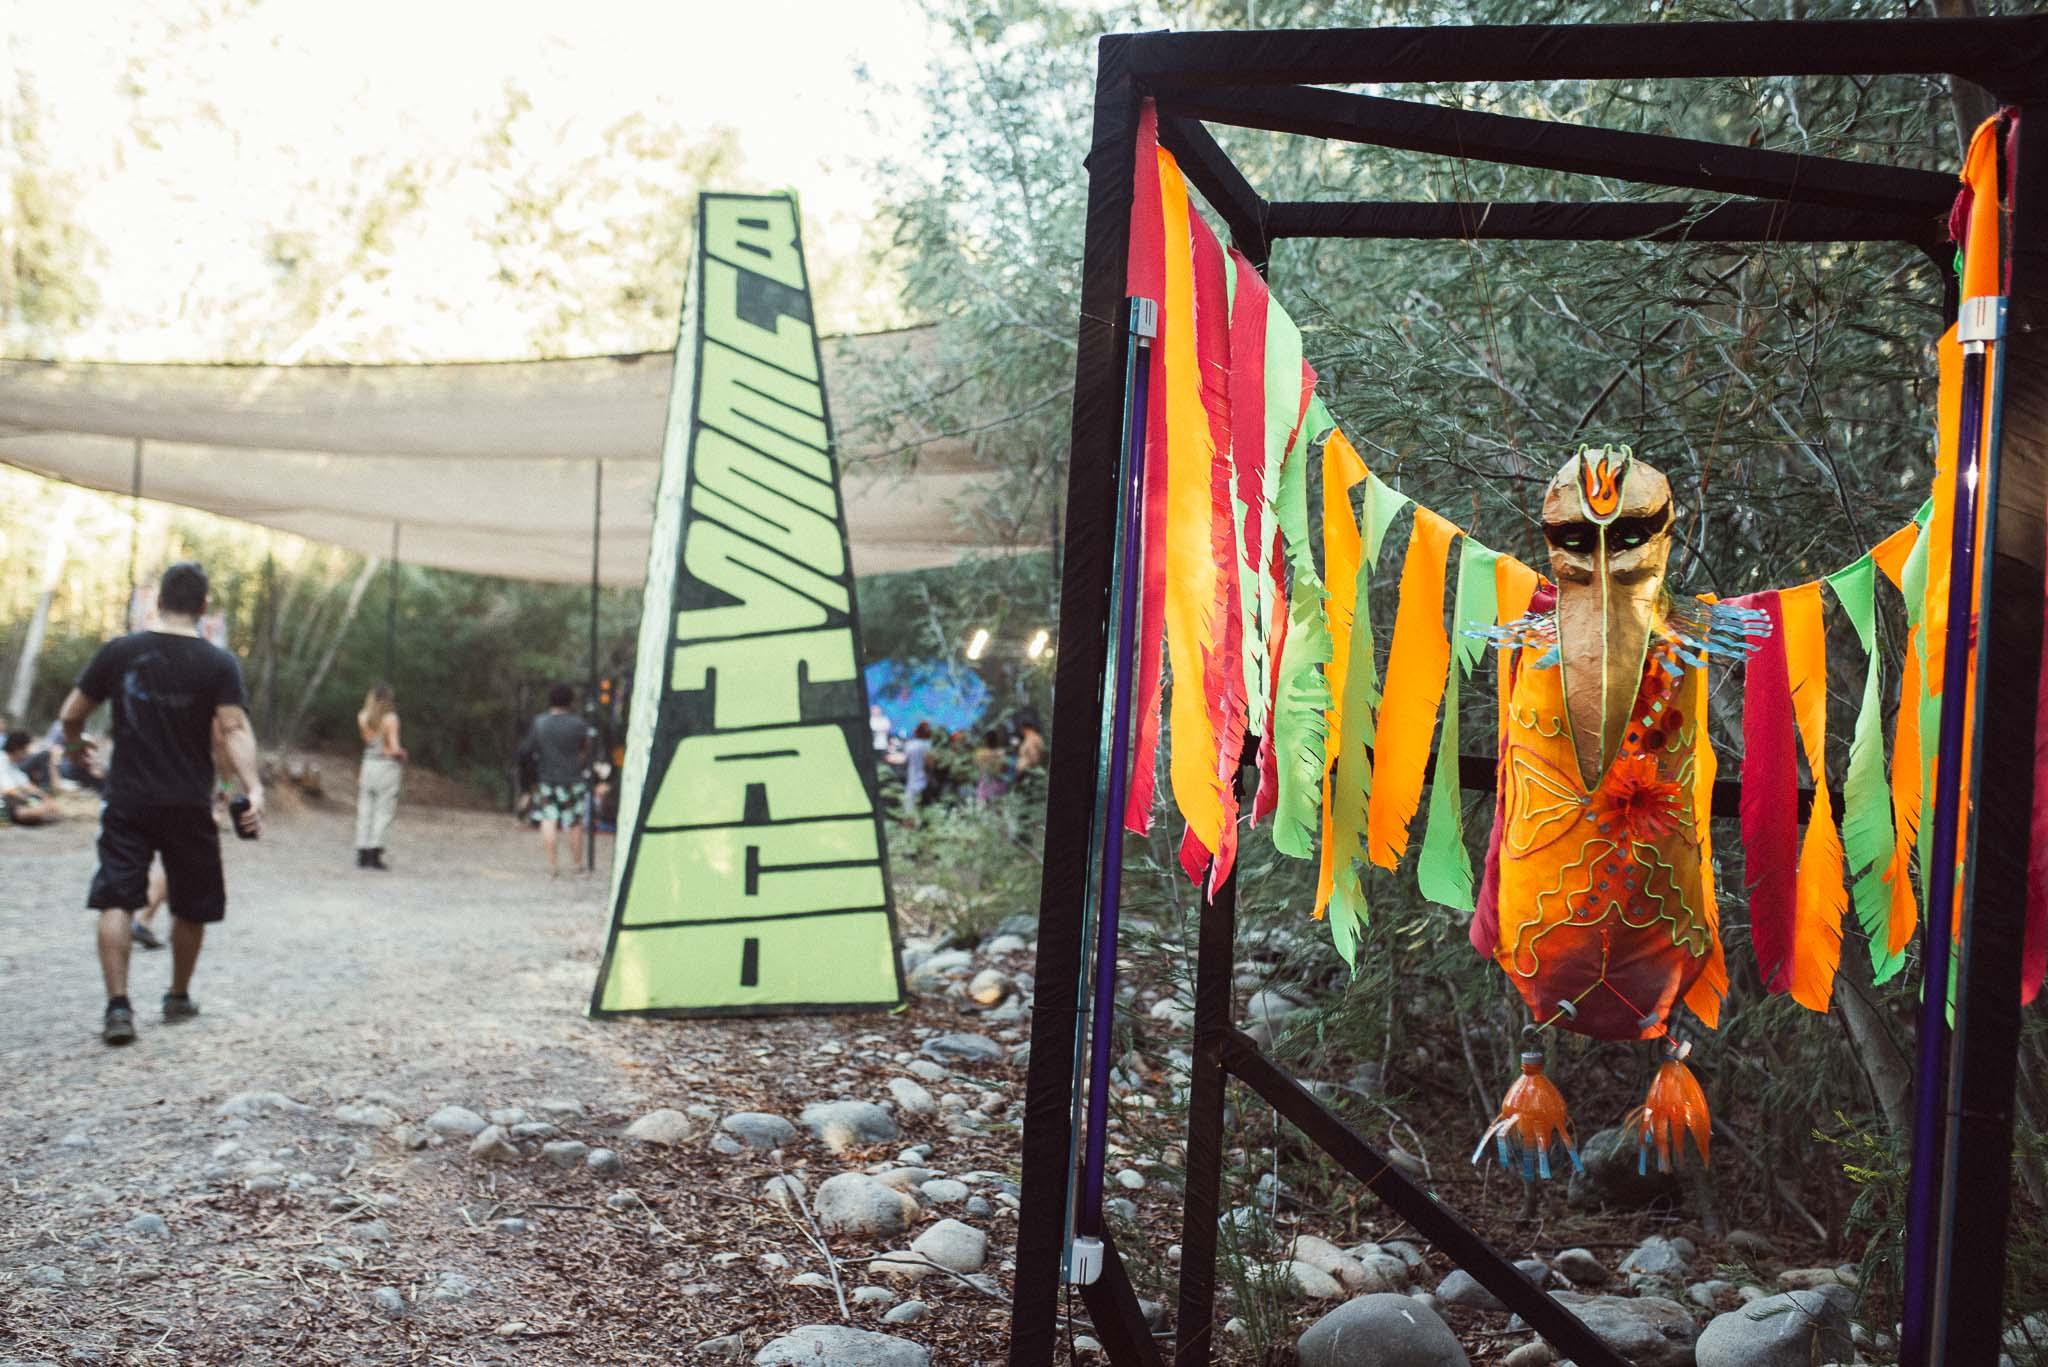 festival woodstaco-parral-diego mena fotografia